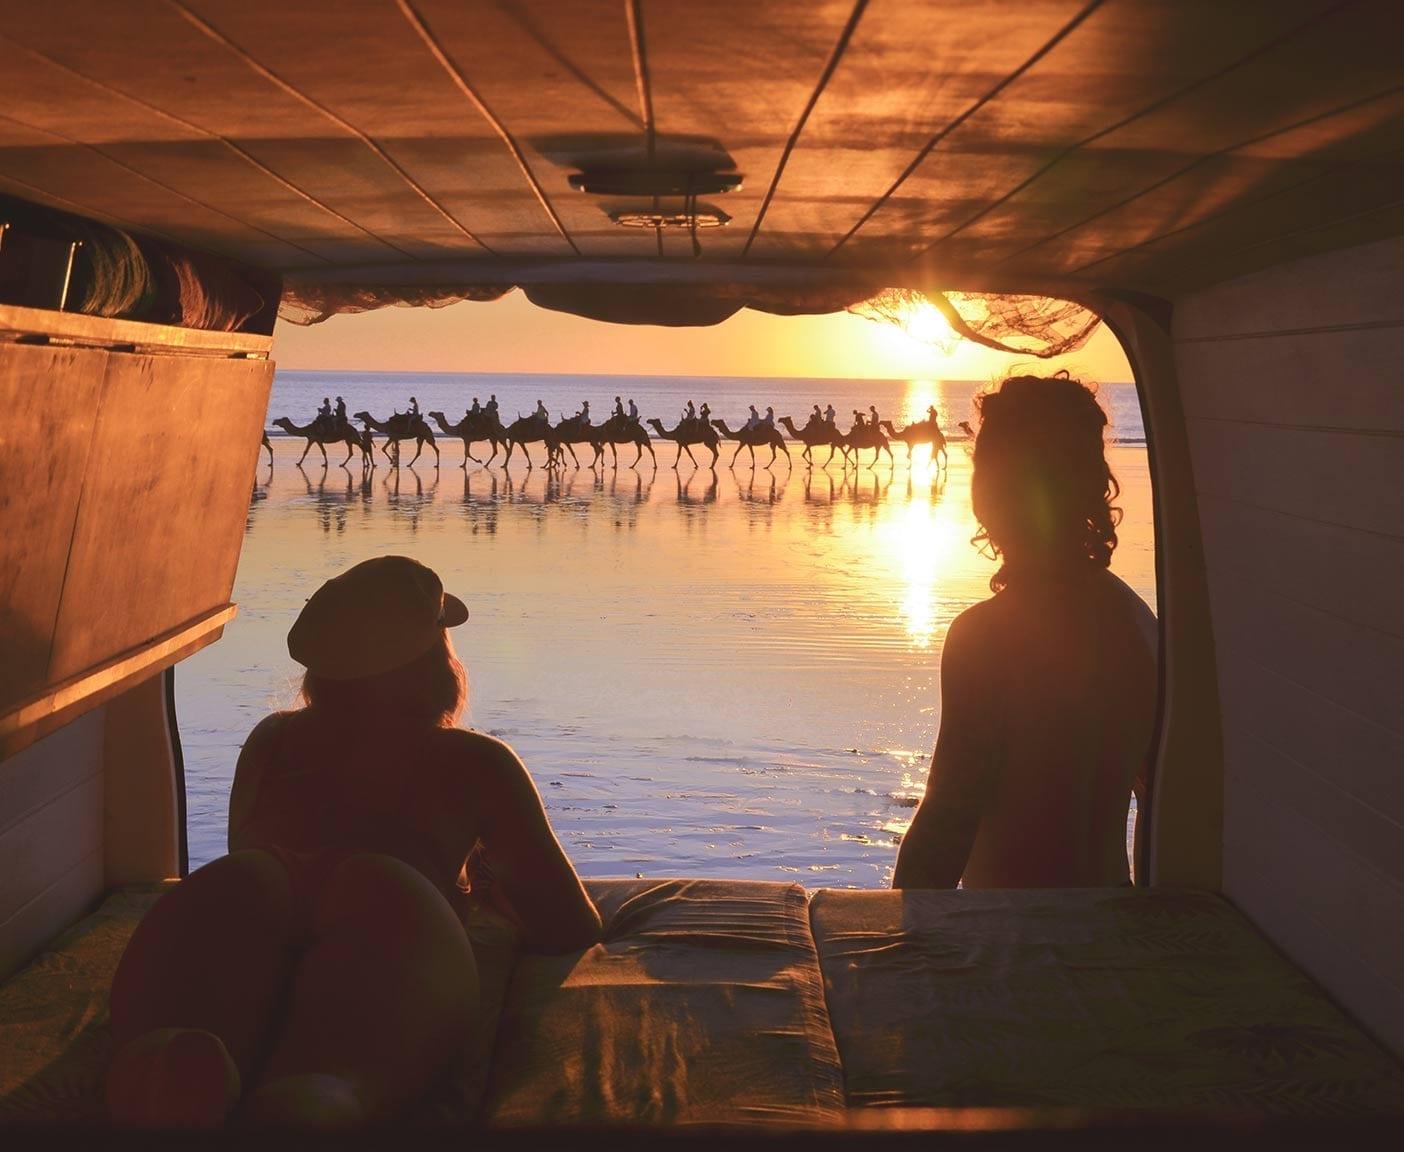 Toyota-hiace-camper-4x4-van-camping-couple-sunset-view-auszeit-vanlife